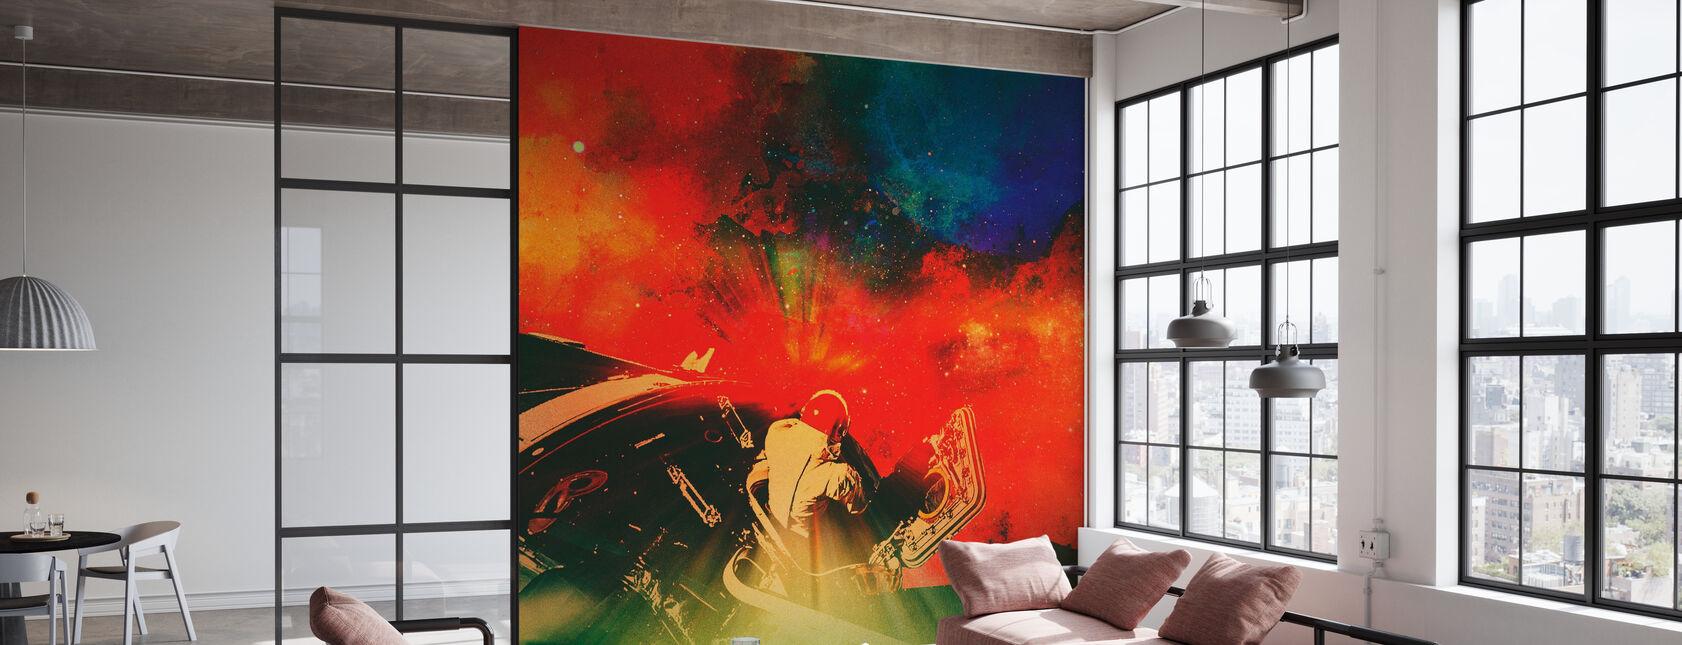 Psychonaut - Wallpaper - Office